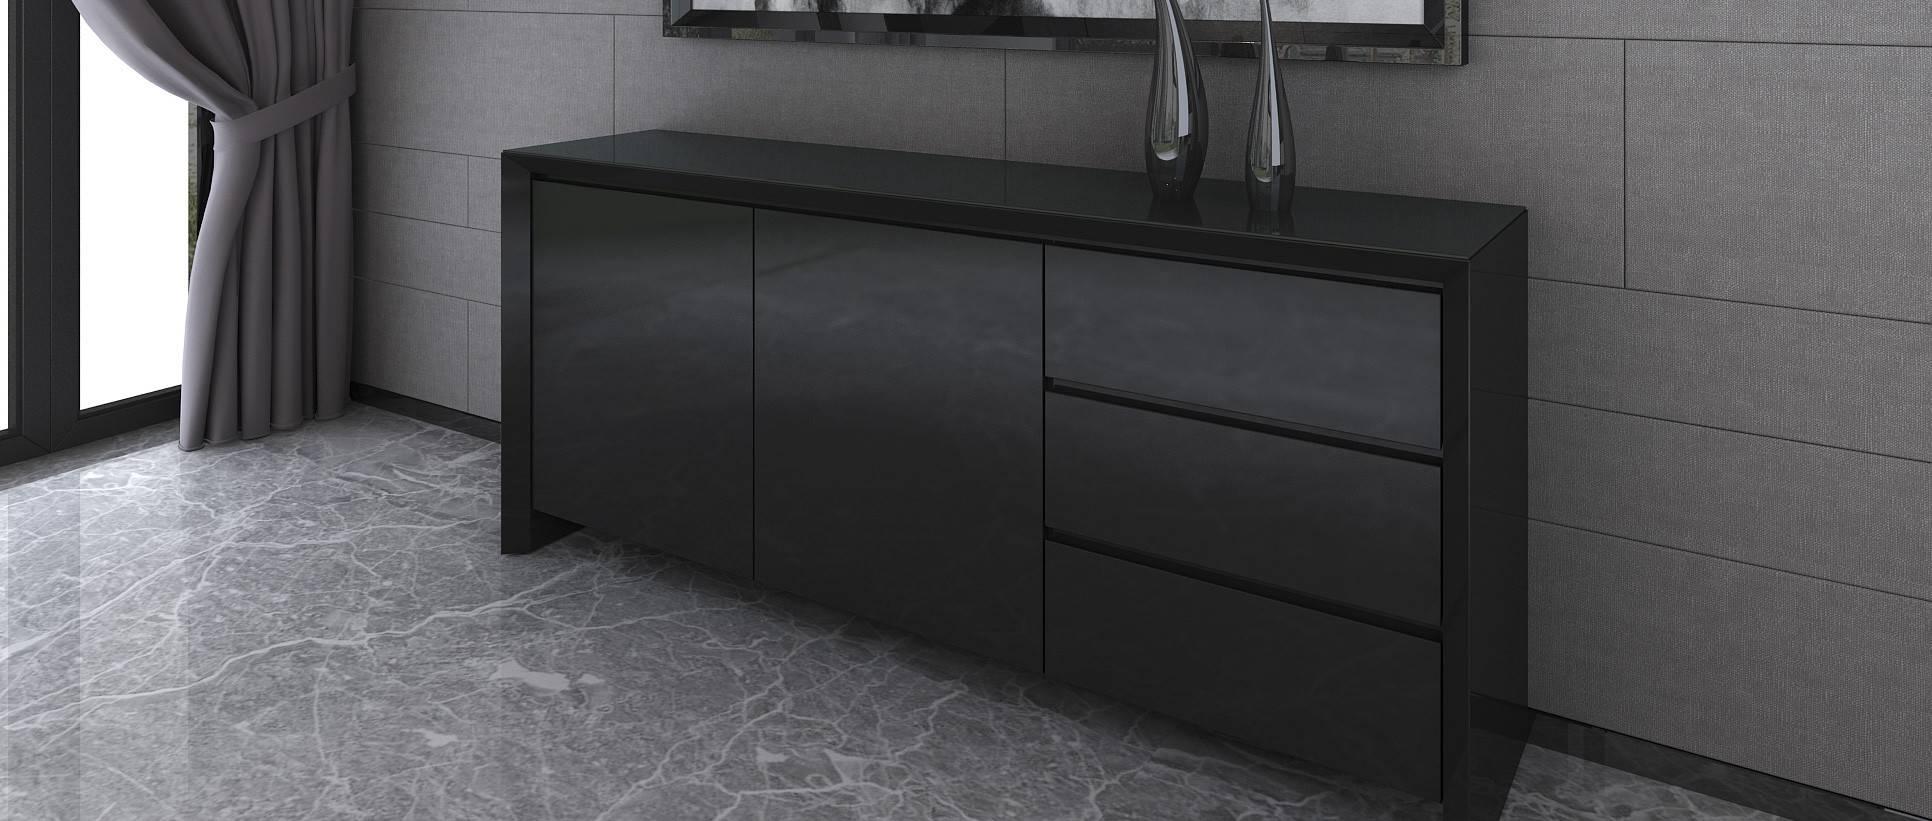 Soho – Extra Large Sideboard – Black High Gloss Throughout Black High Gloss Sideboard (#19 of 20)